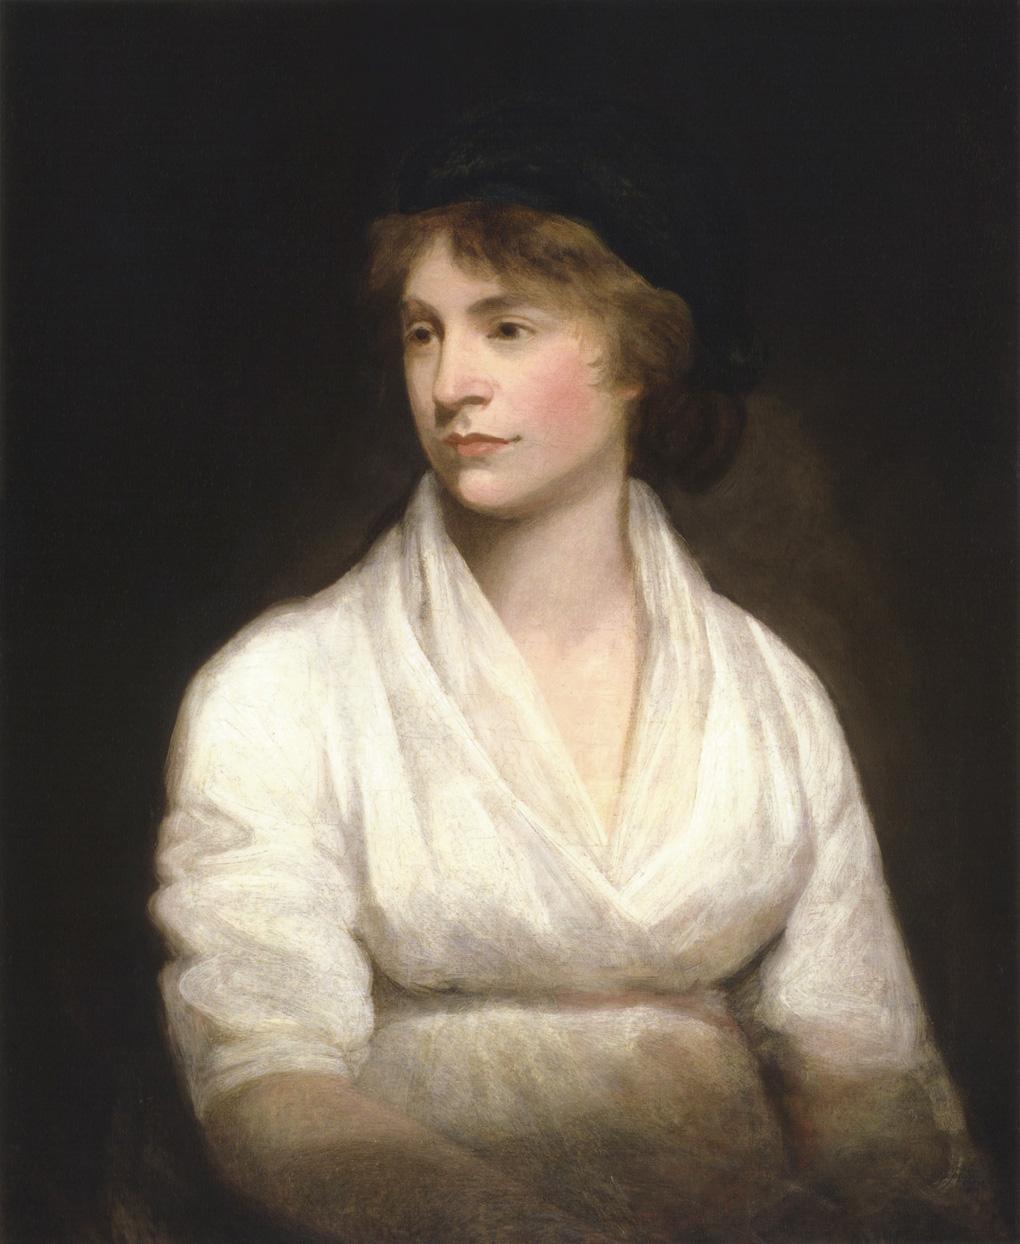 Mary Wollstonecraft, by John Opie, 1797